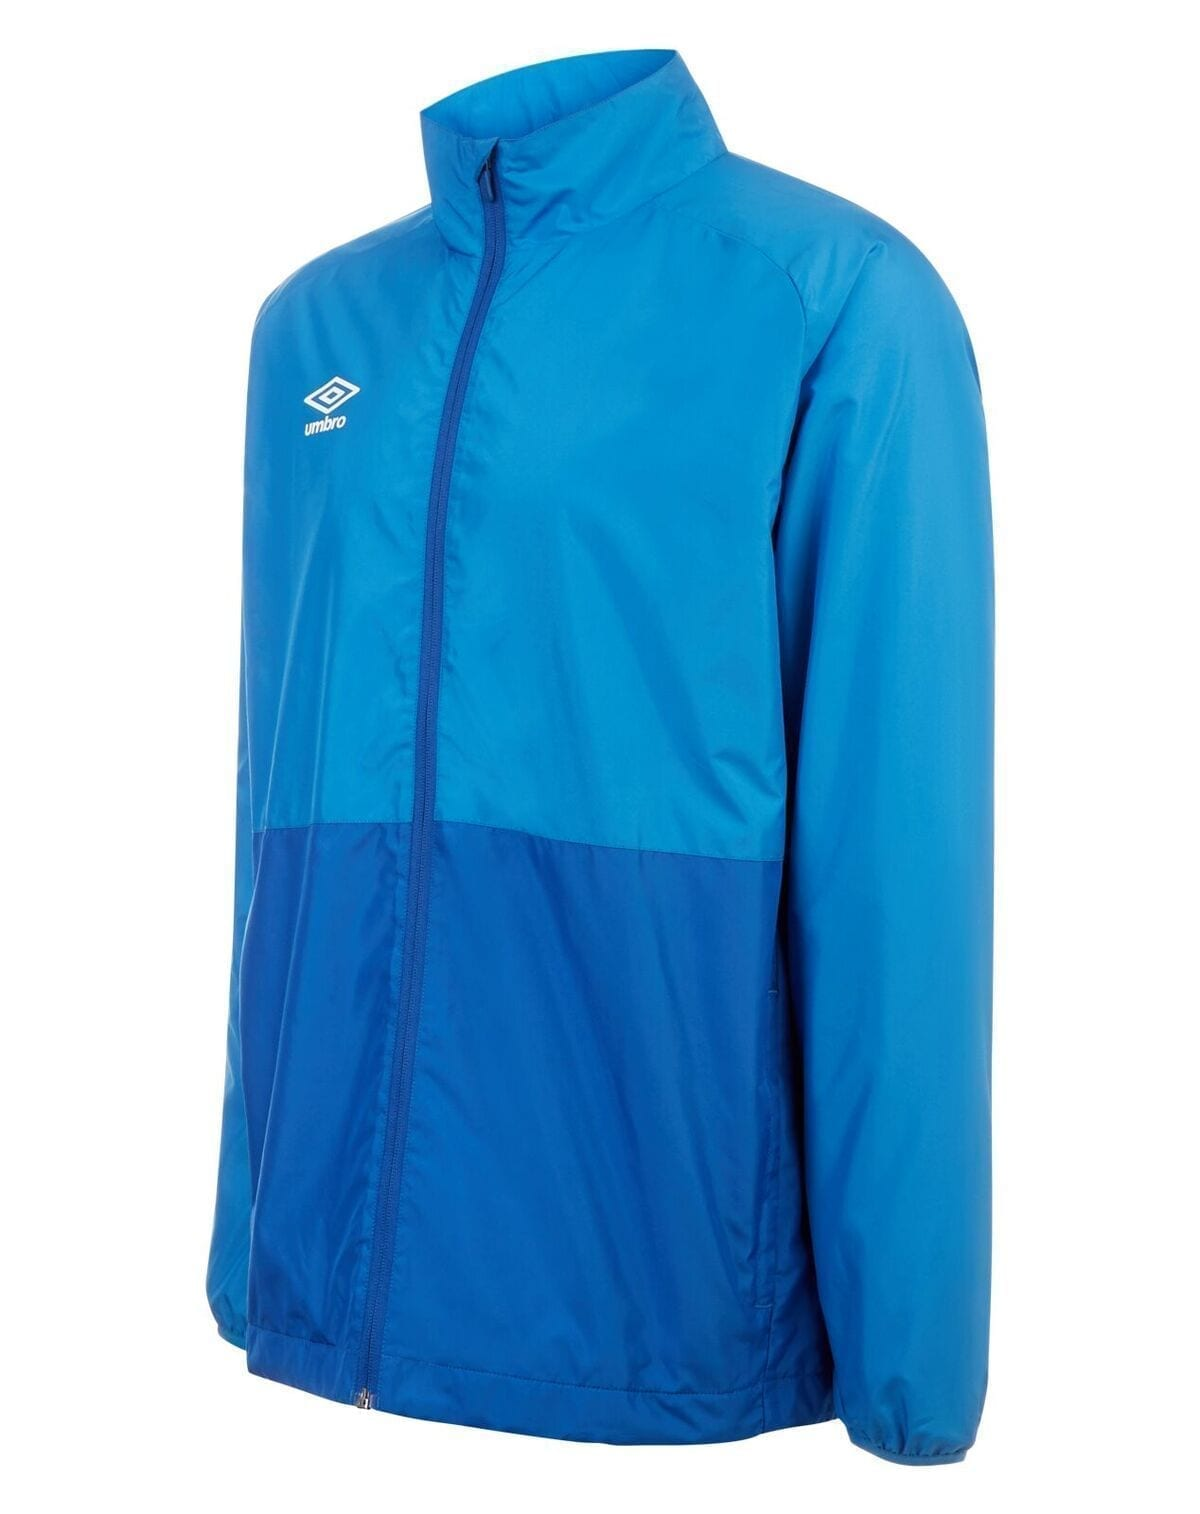 shower jacket royal french blue 30462 p